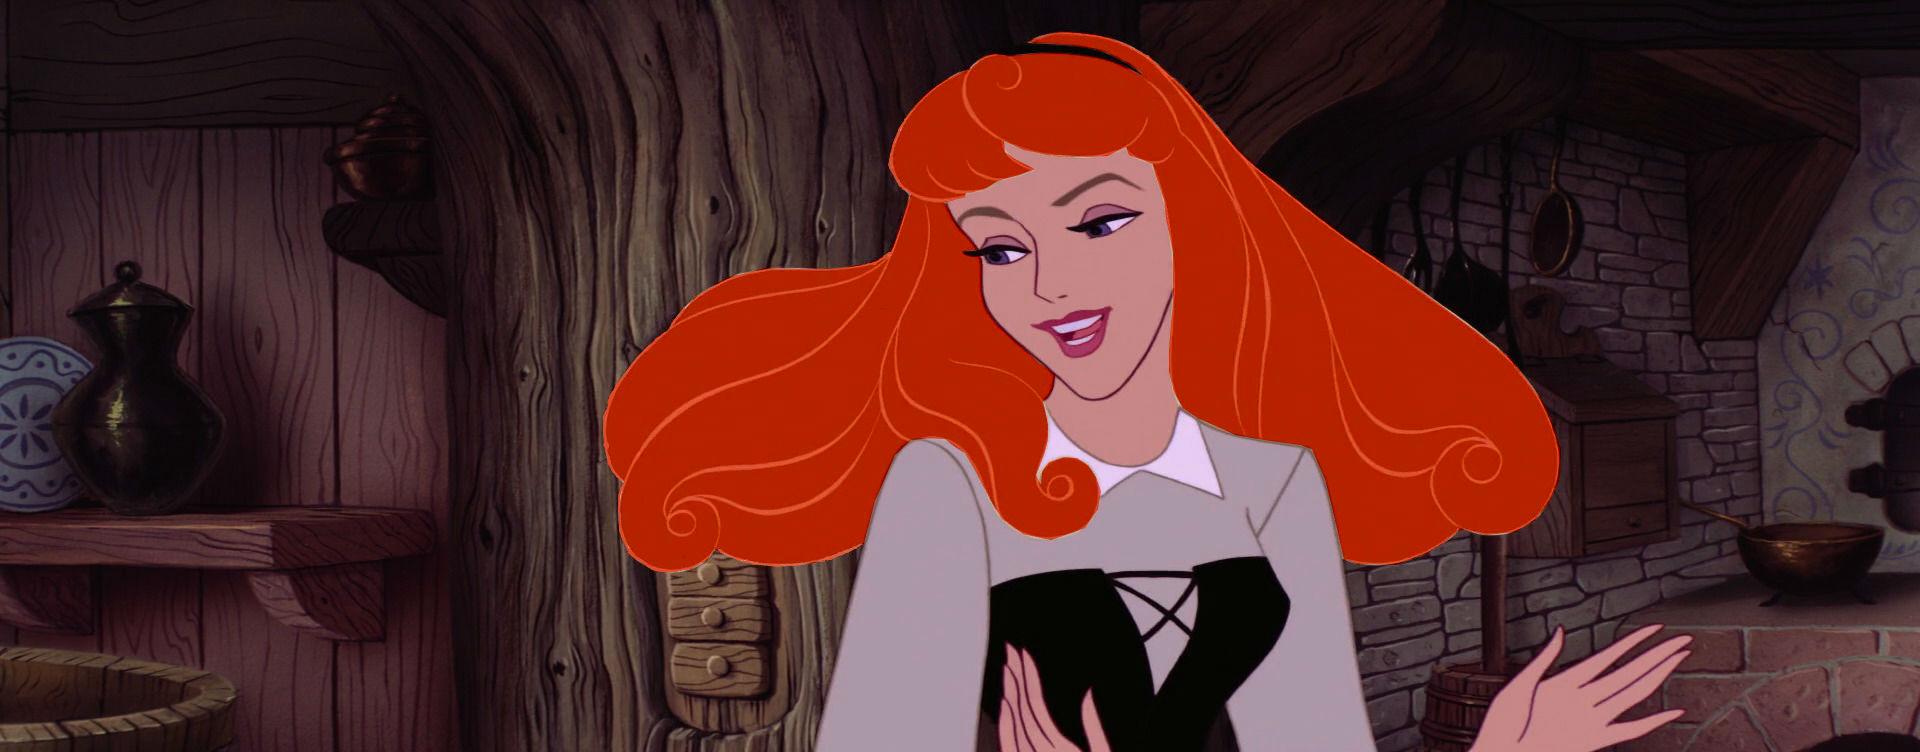 Aurora with red hair - Disney Princess Photo (36929739 ...